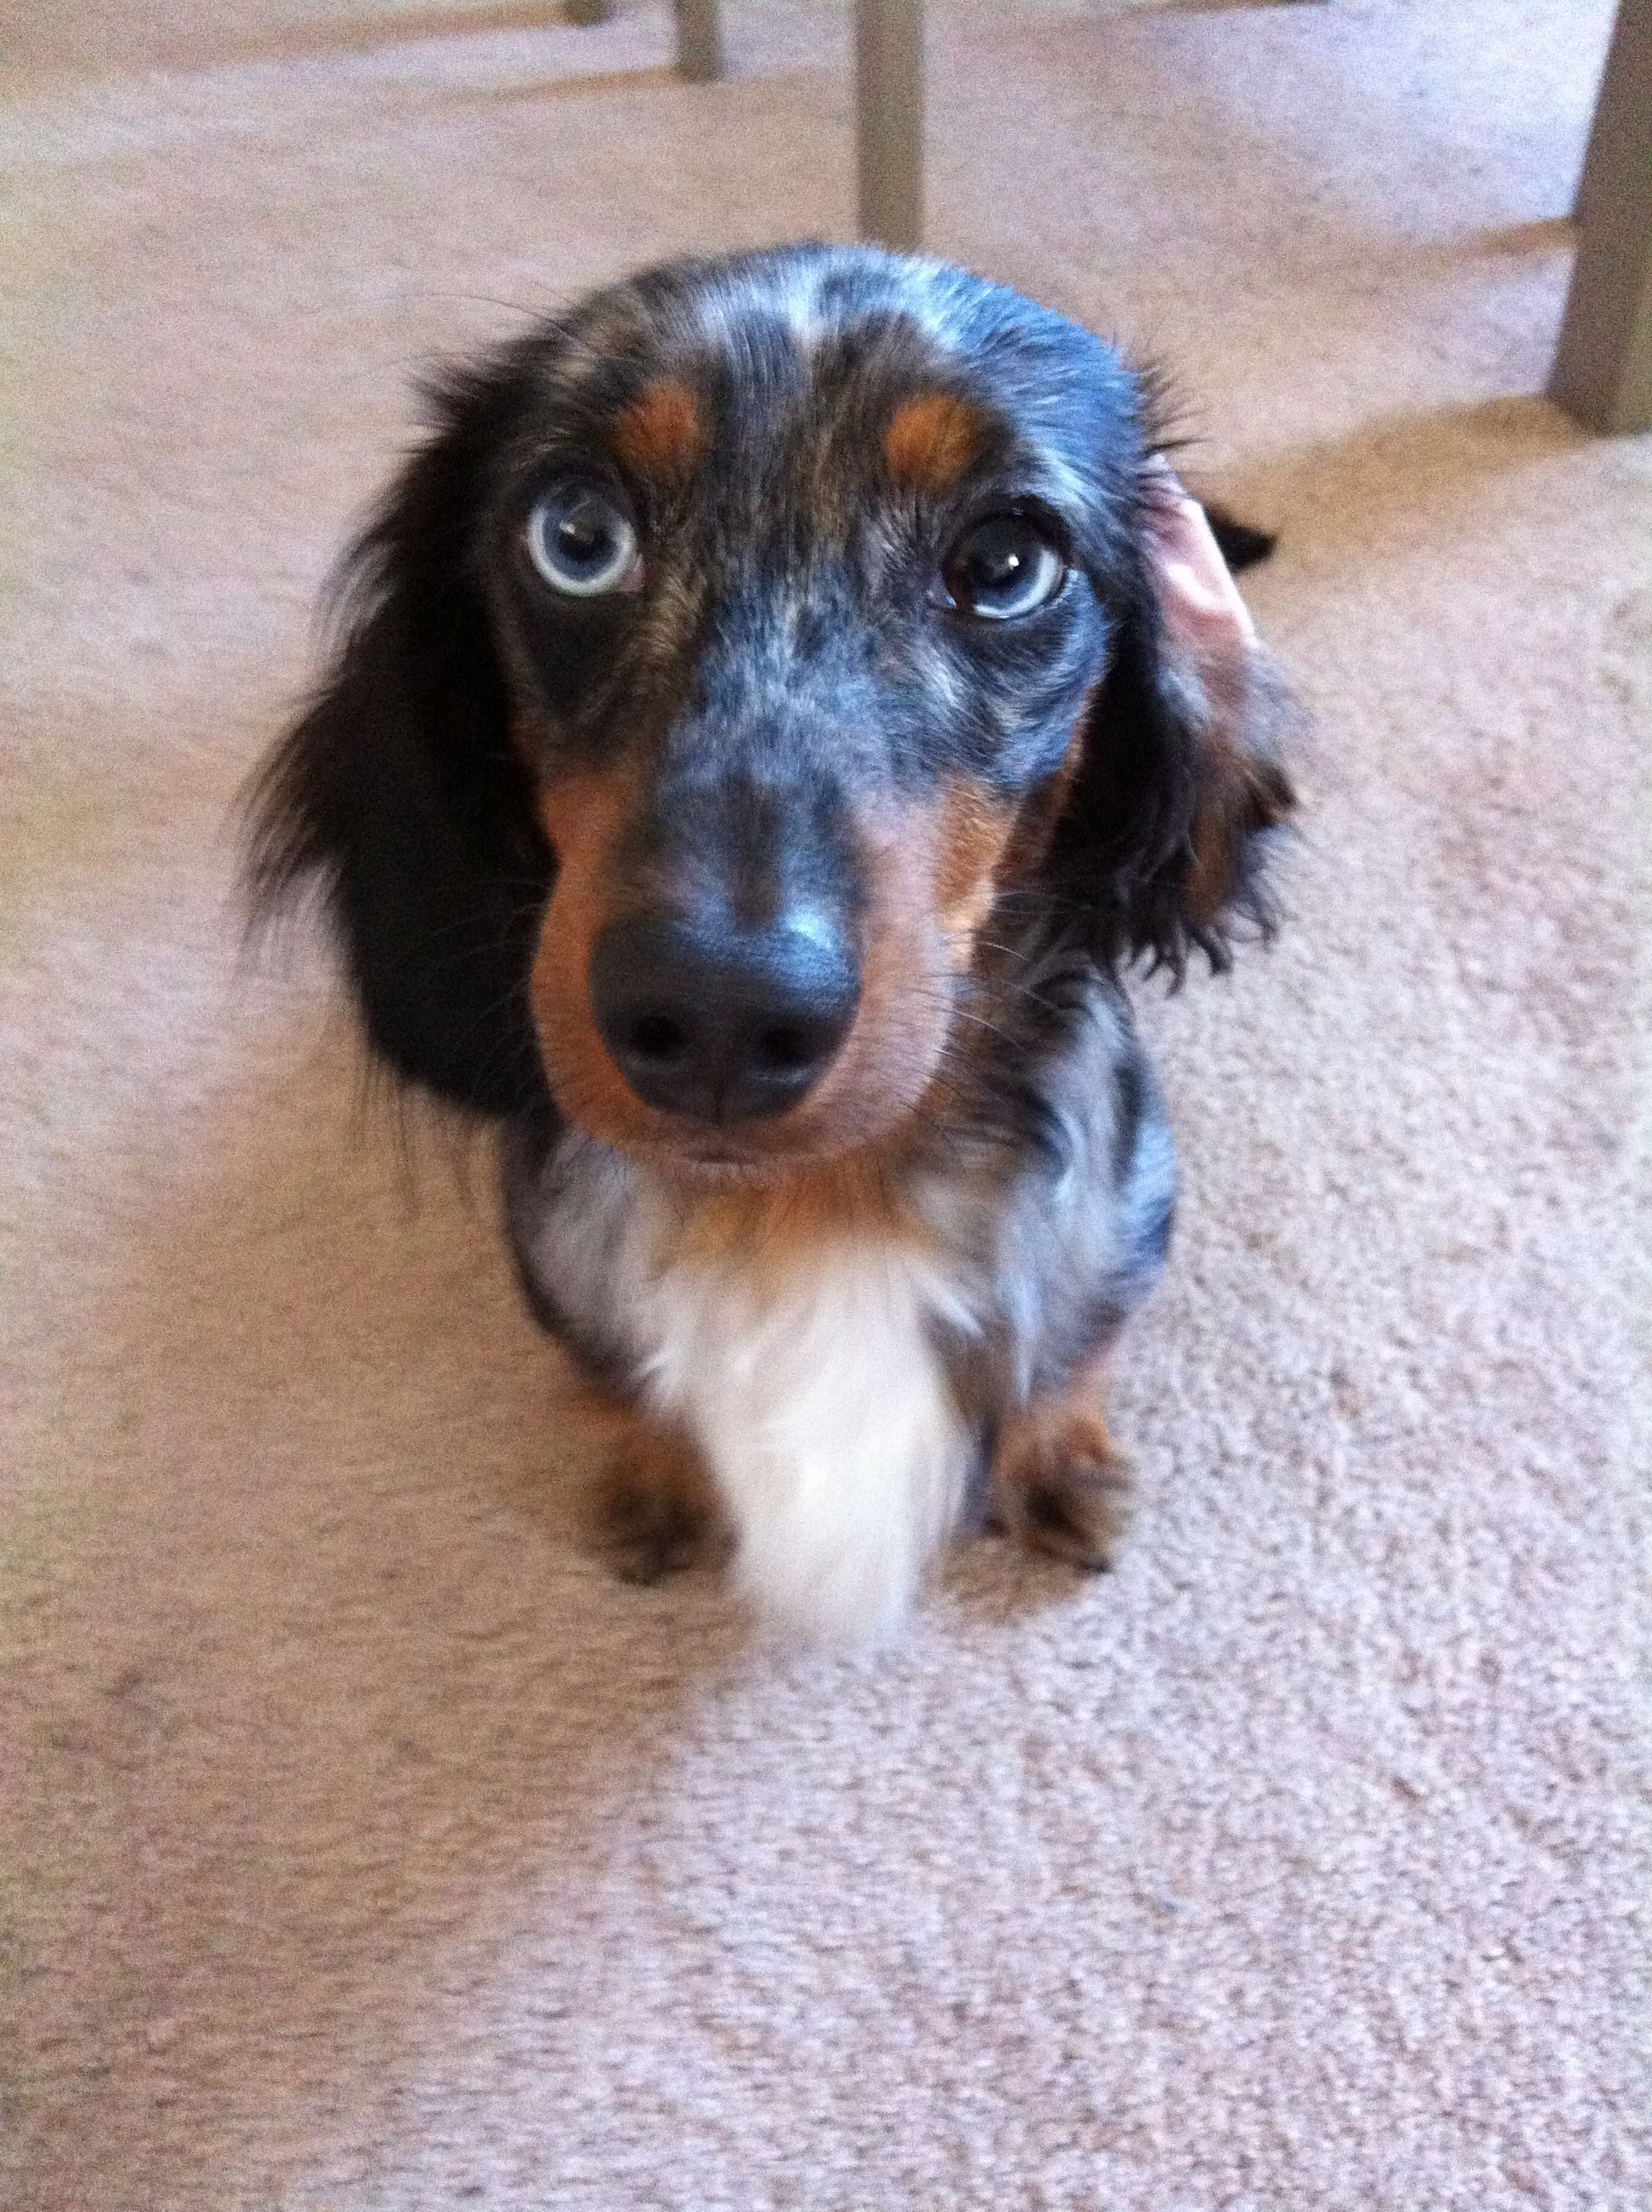 Little Leroy! Our dapple dachshund